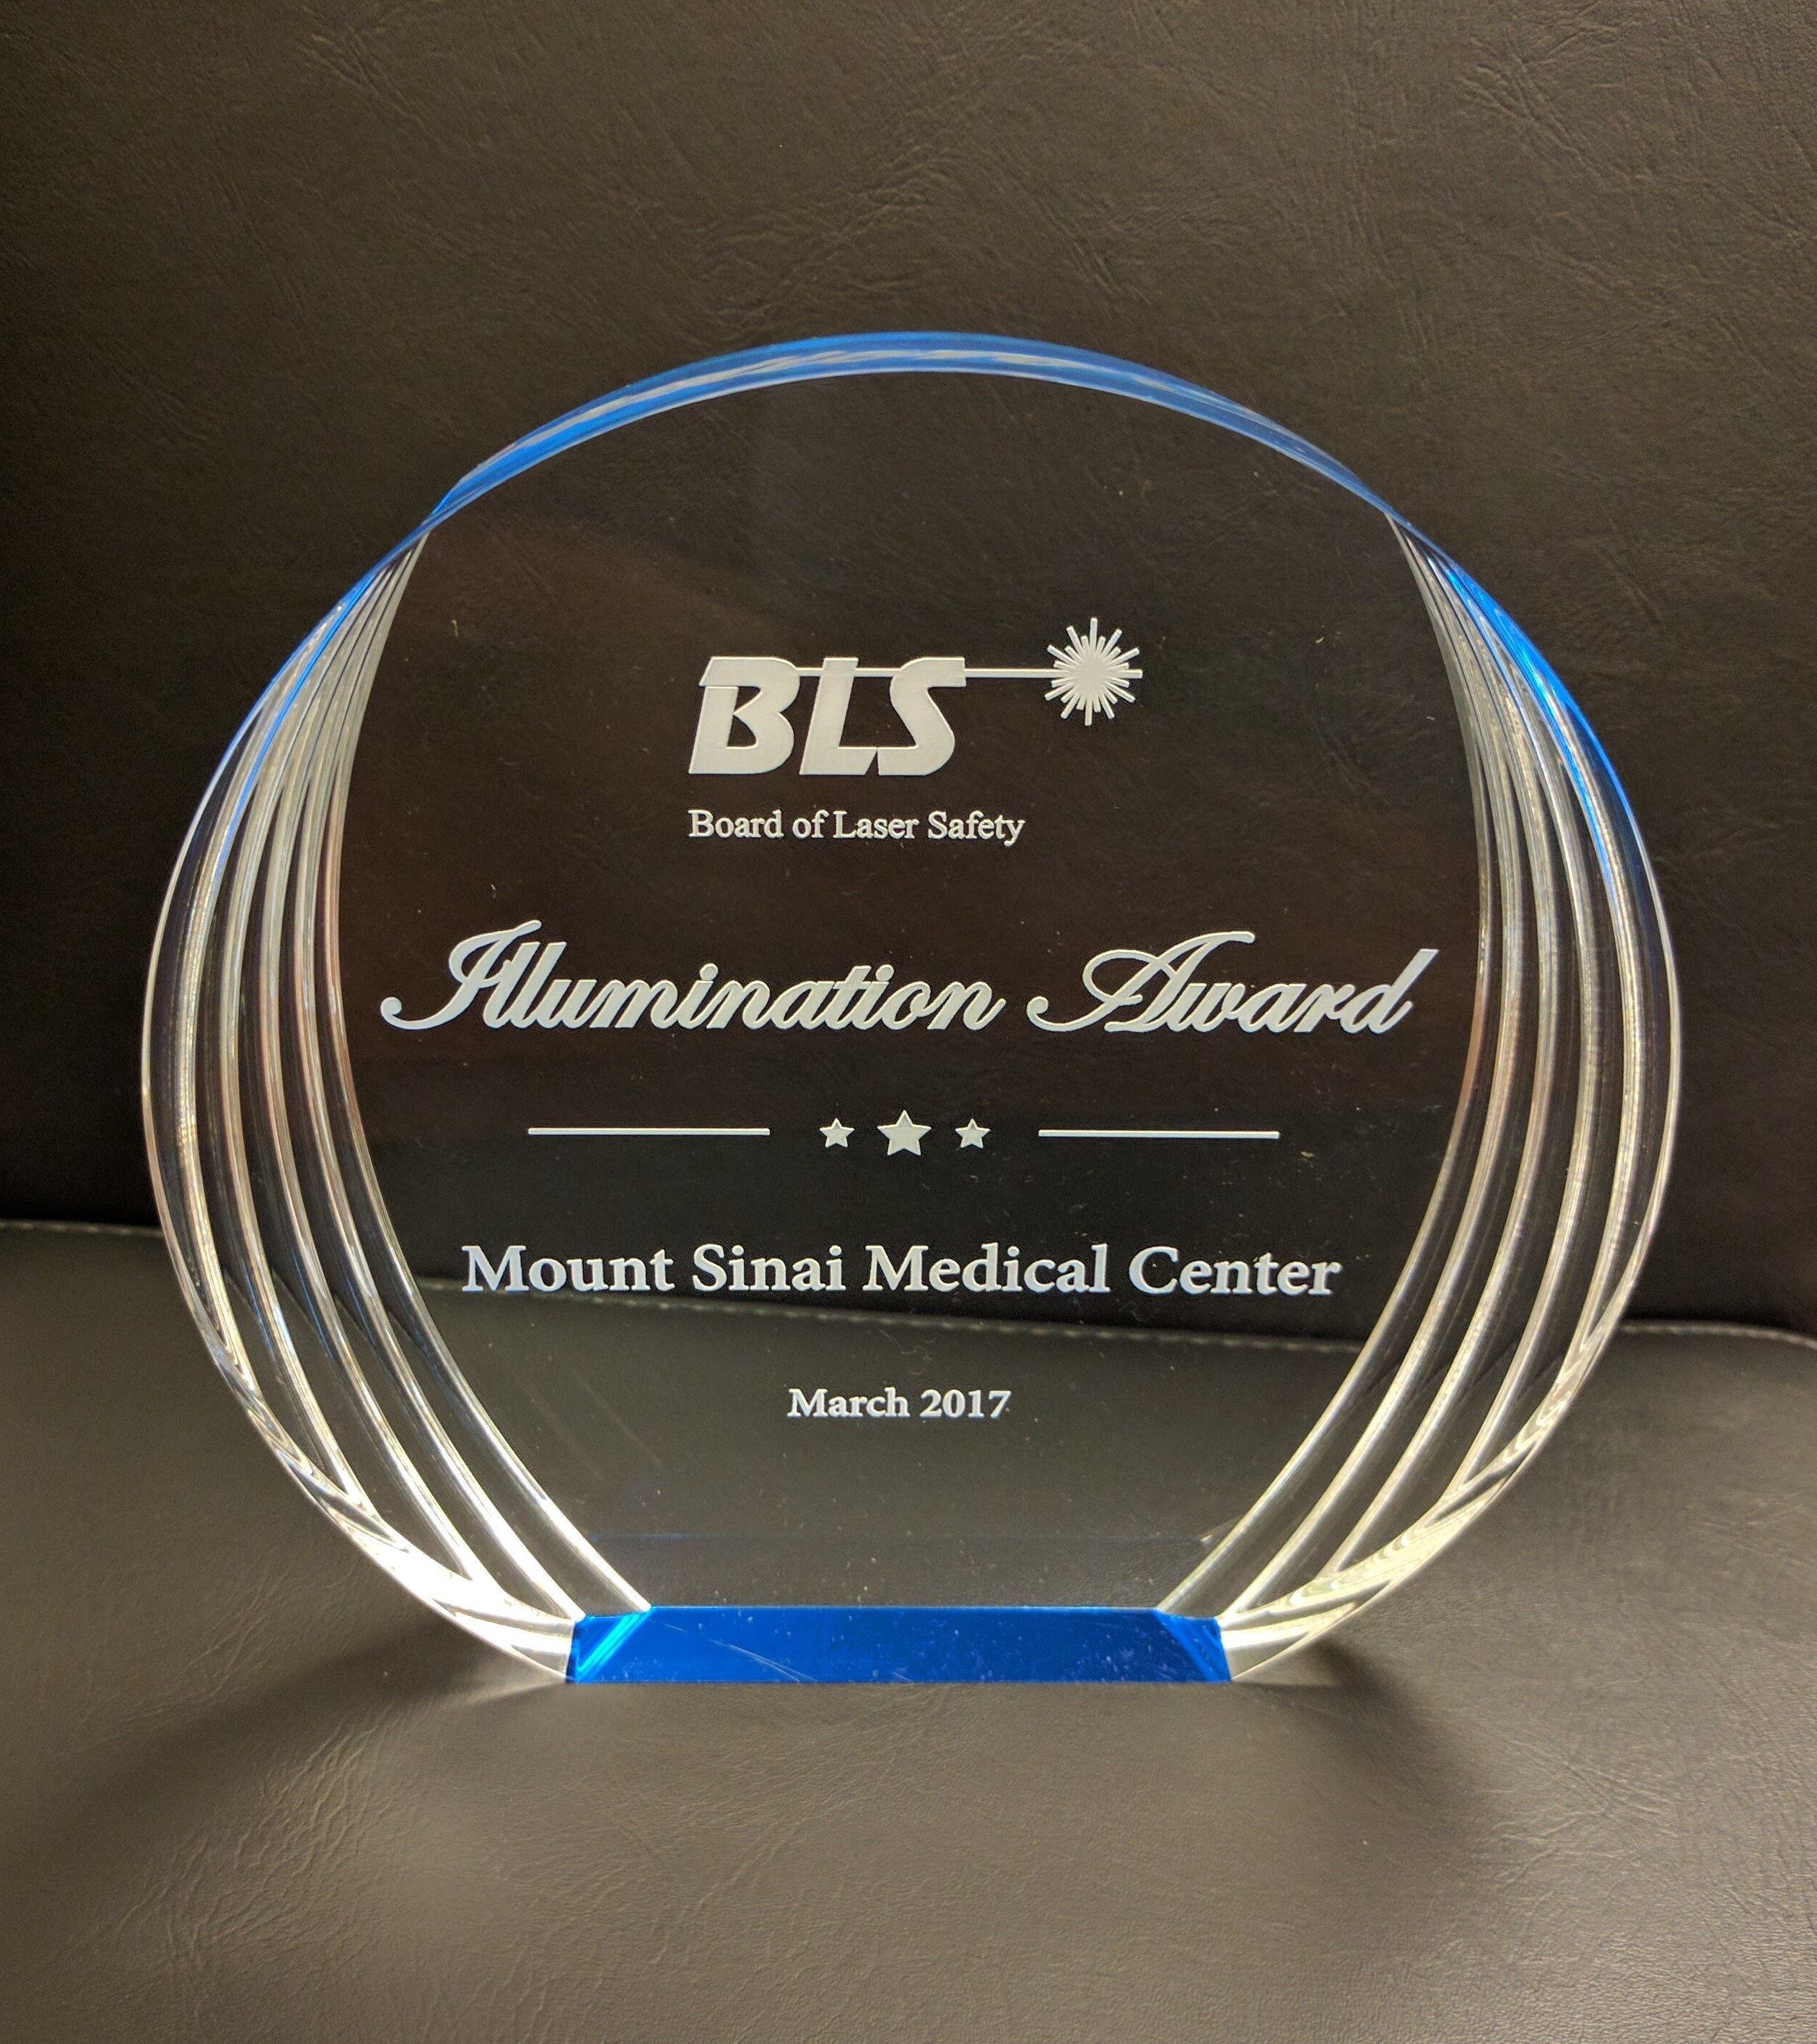 BLS-Plaque-to-Mount-Sinai